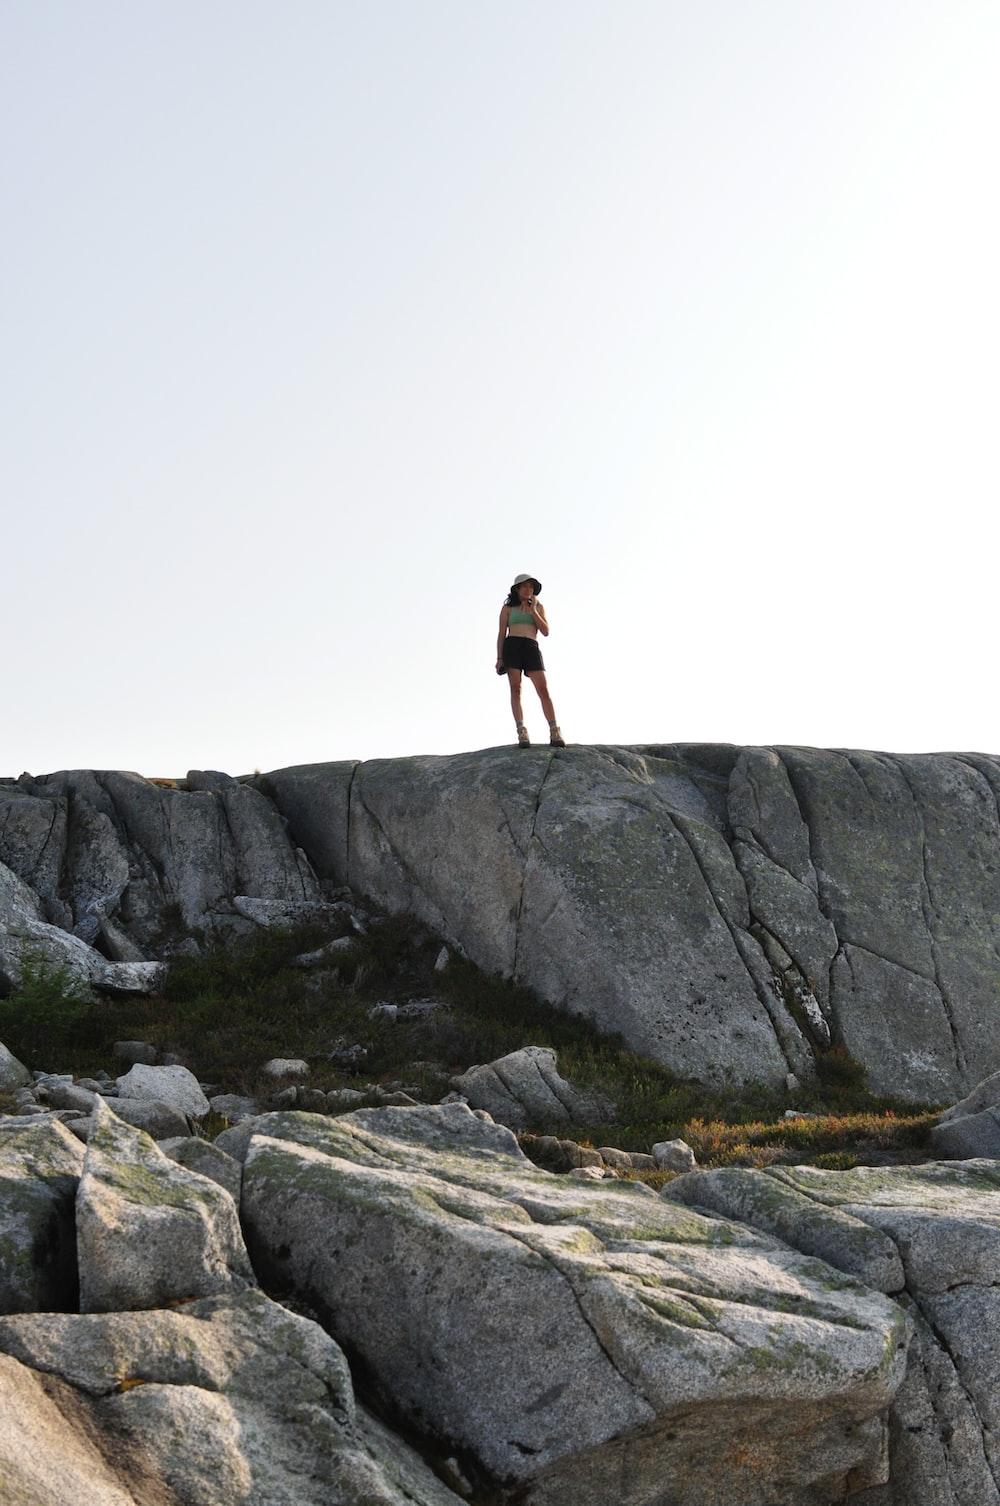 woman standing on grey rock on mountain